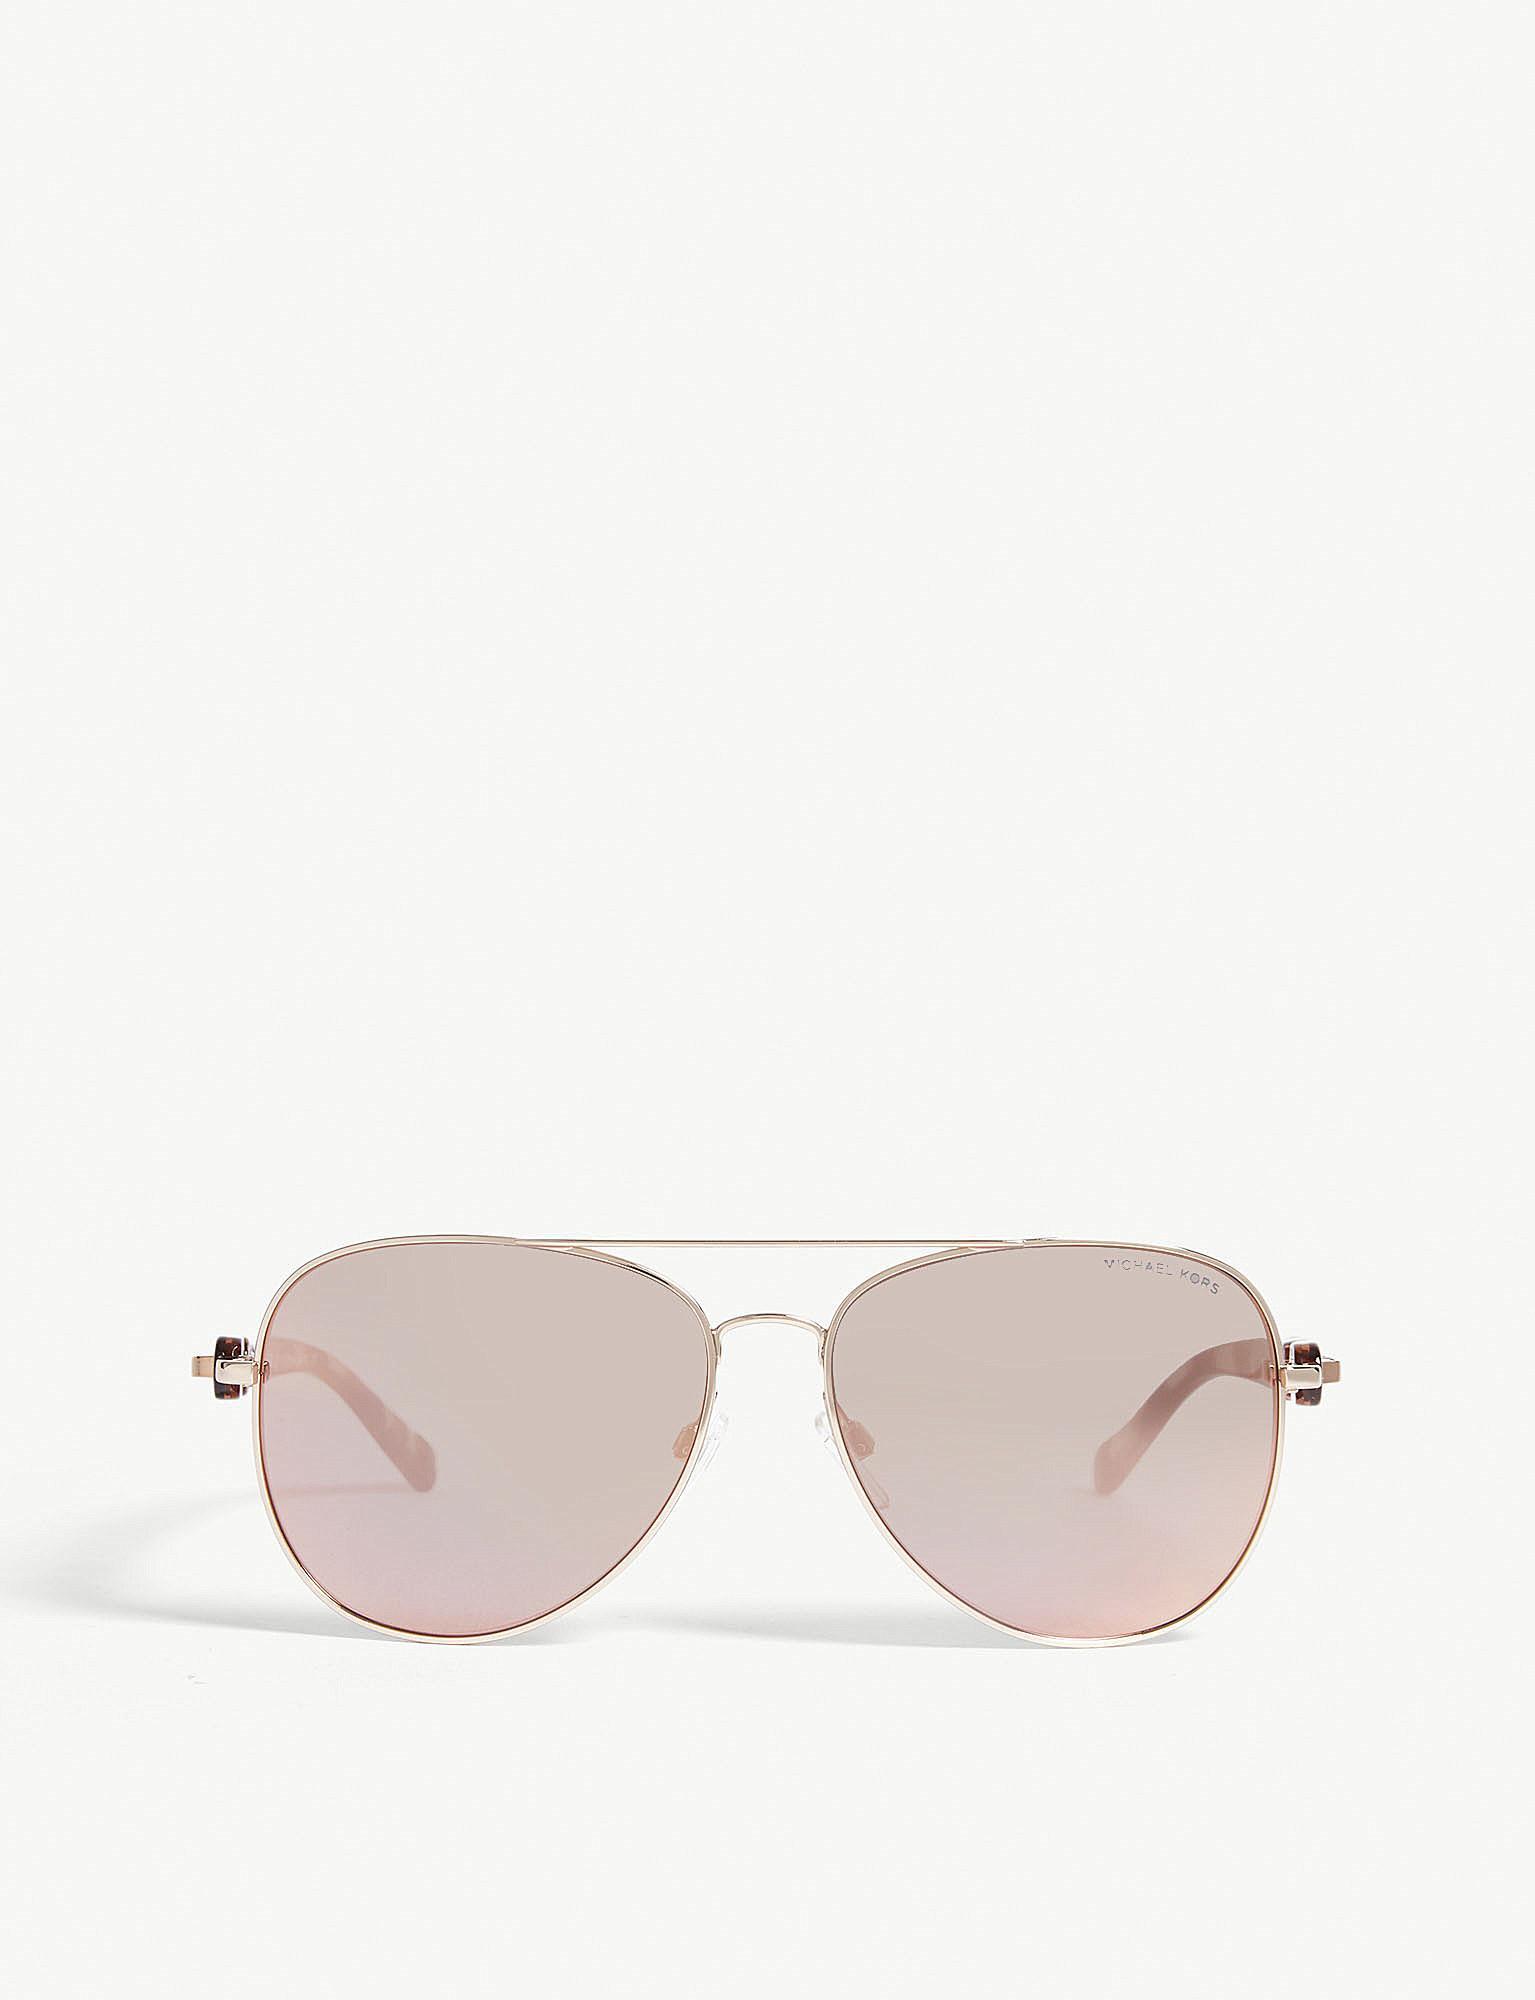 5f52098529c Michael Kors Mk1015 Pandora Pilot-frame Sunglasses in Pink - Lyst